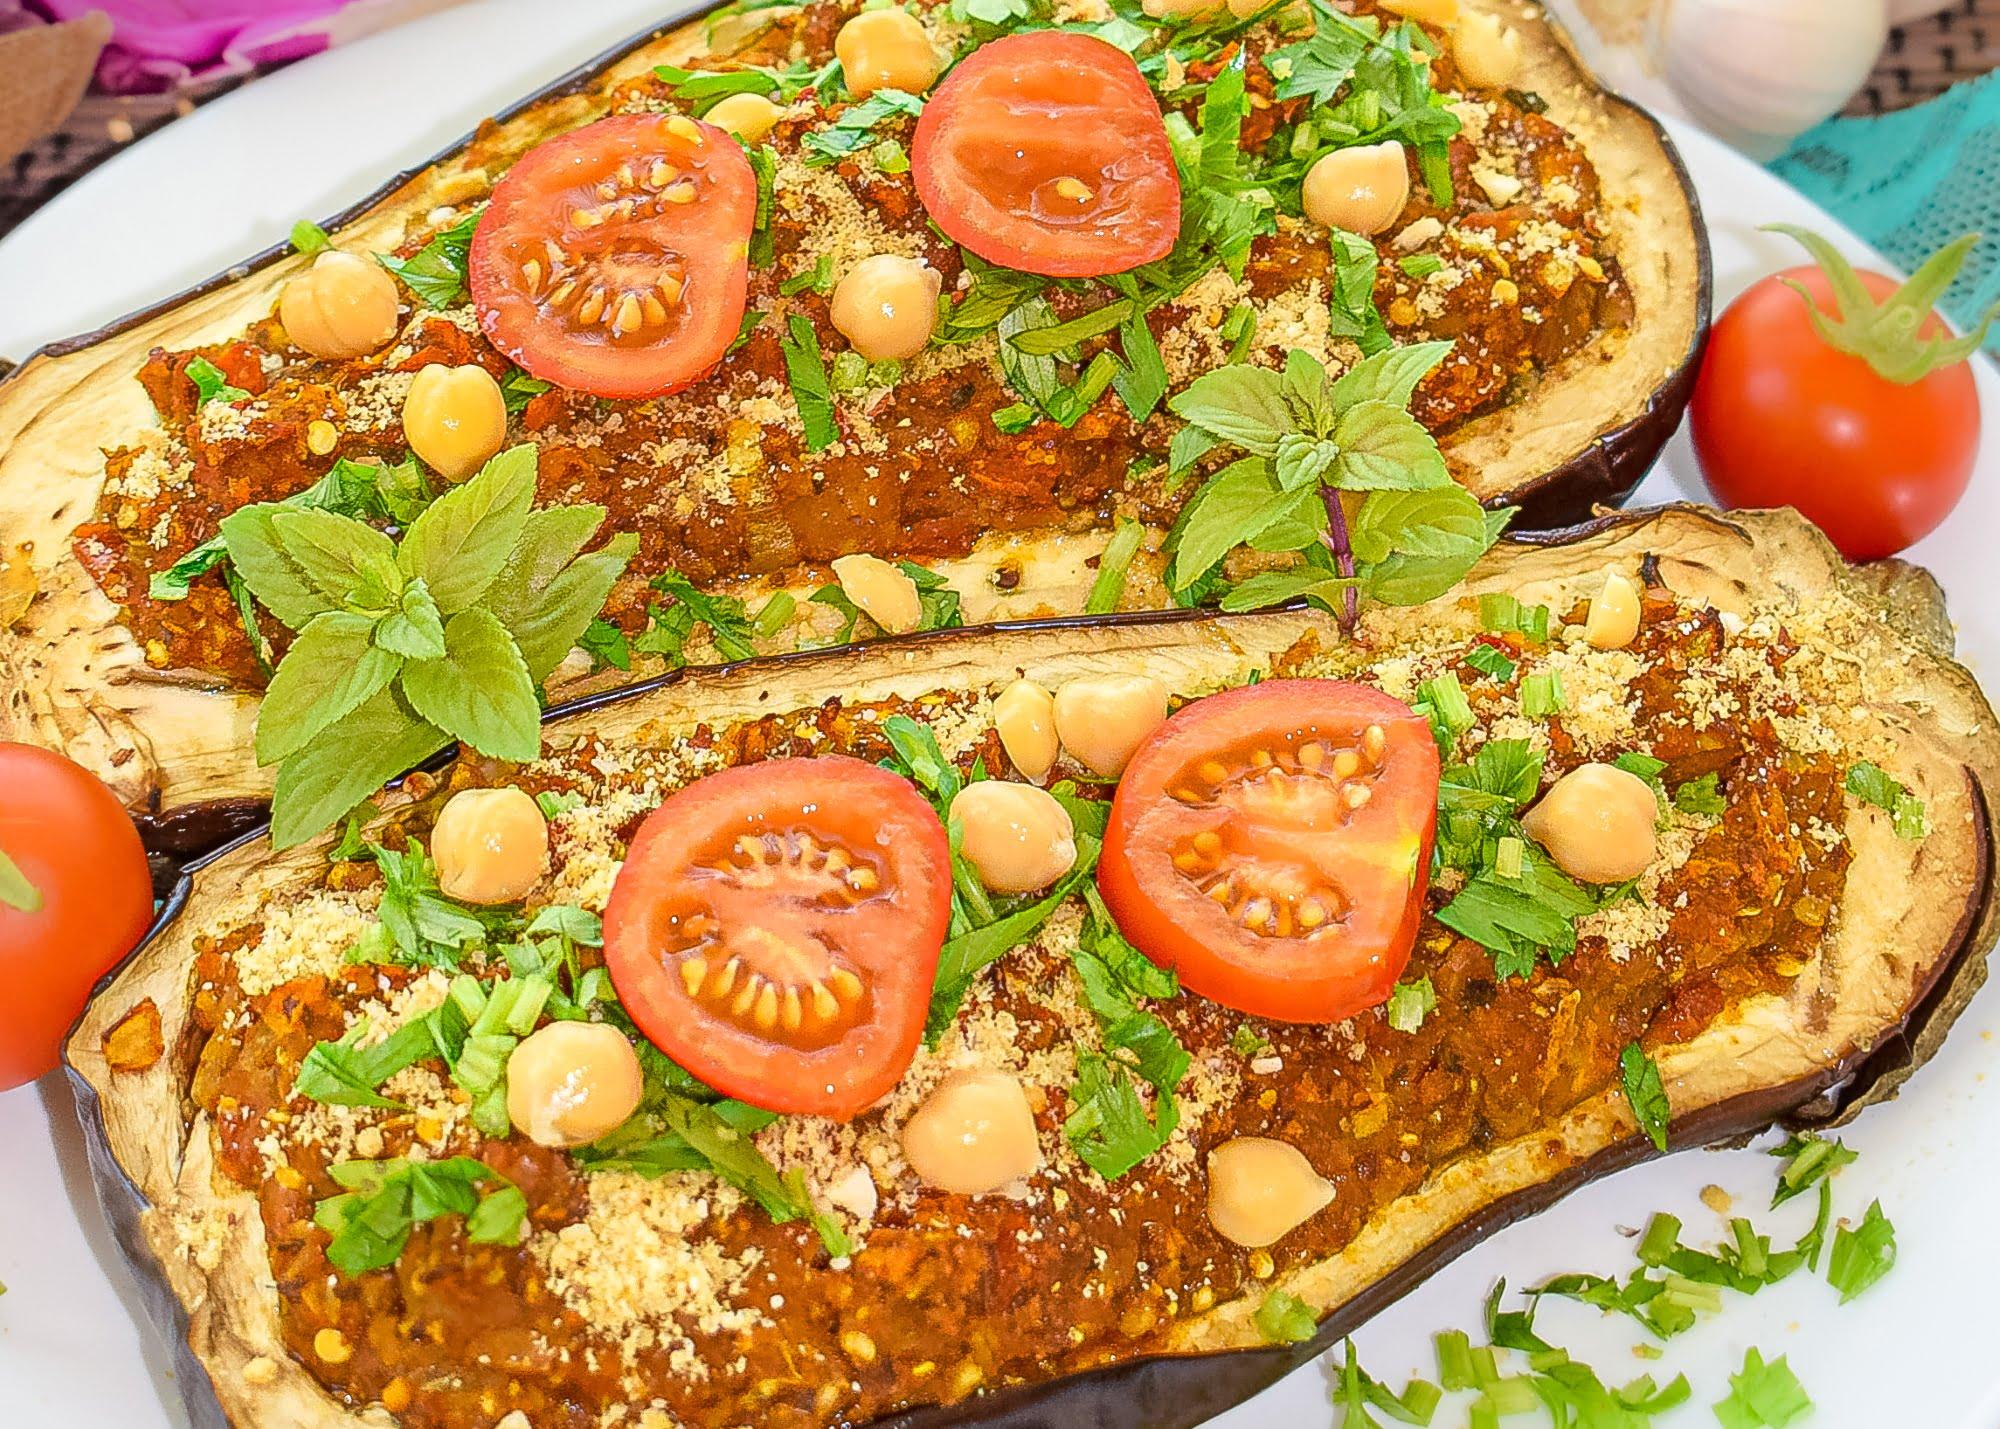 Stuffed Eggplant with Chickpea & Tomato Sauce | Vegan